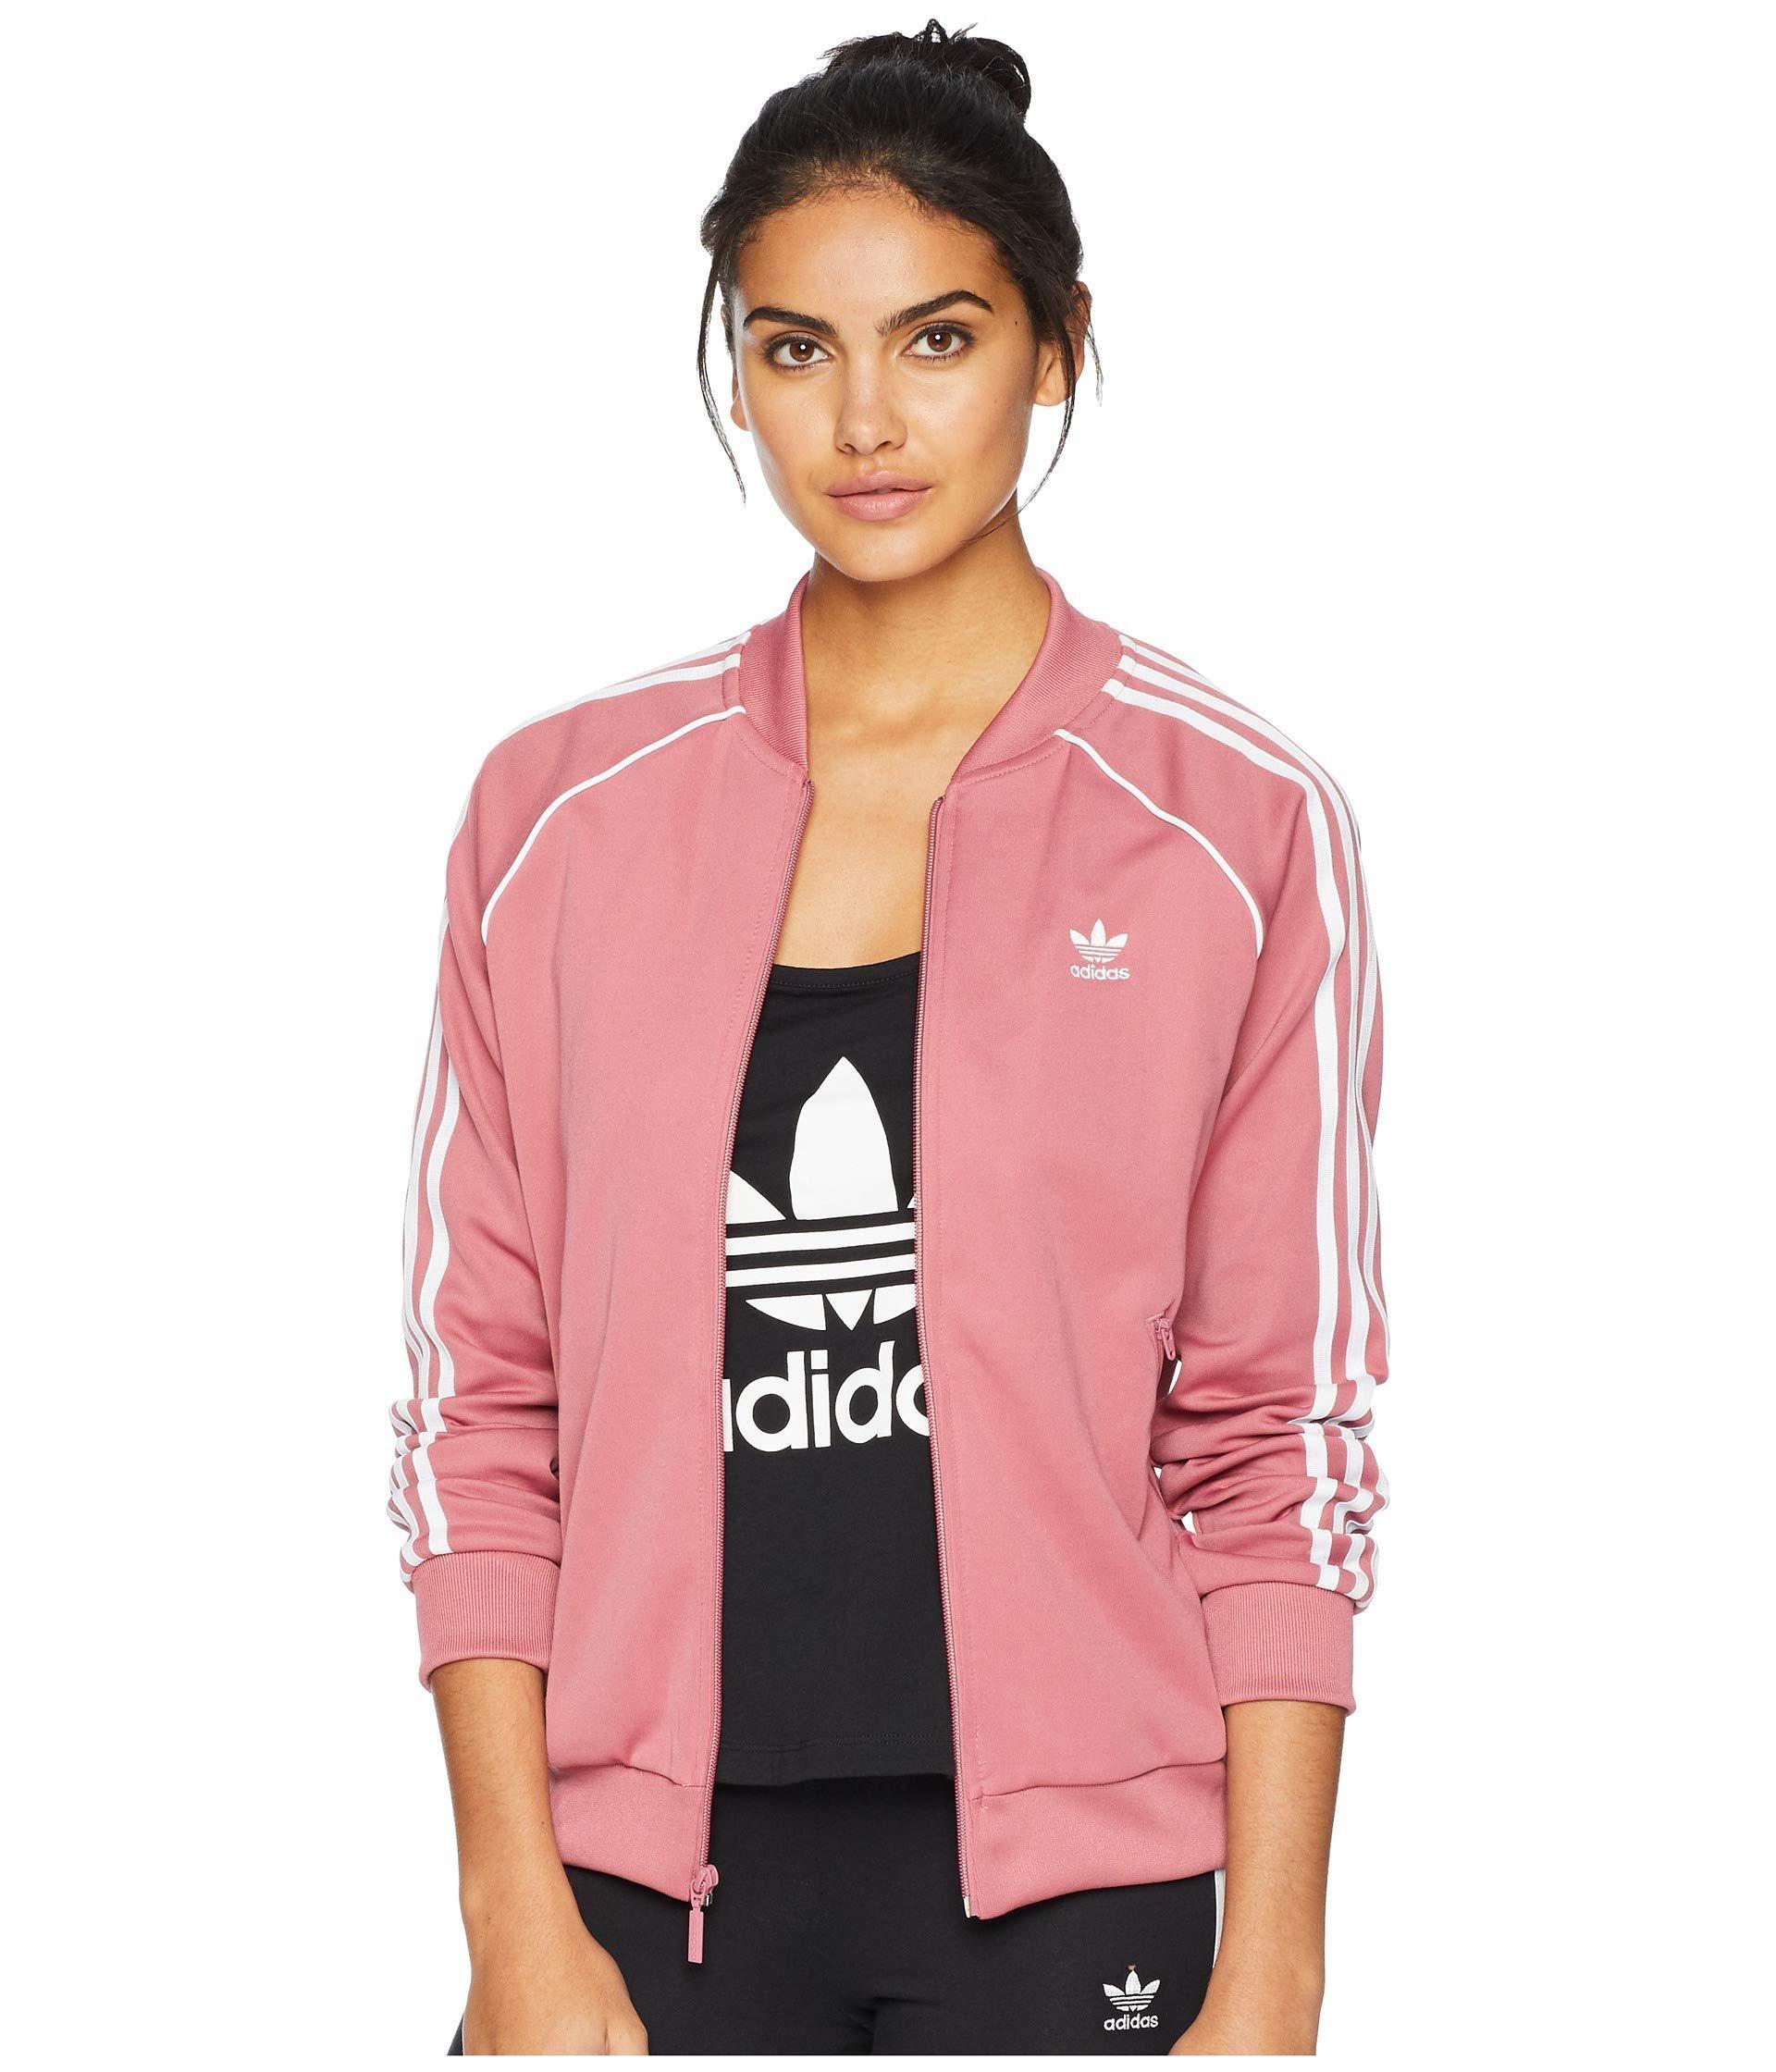 adidas Originals SST Track Jacket Red Womens Jackets